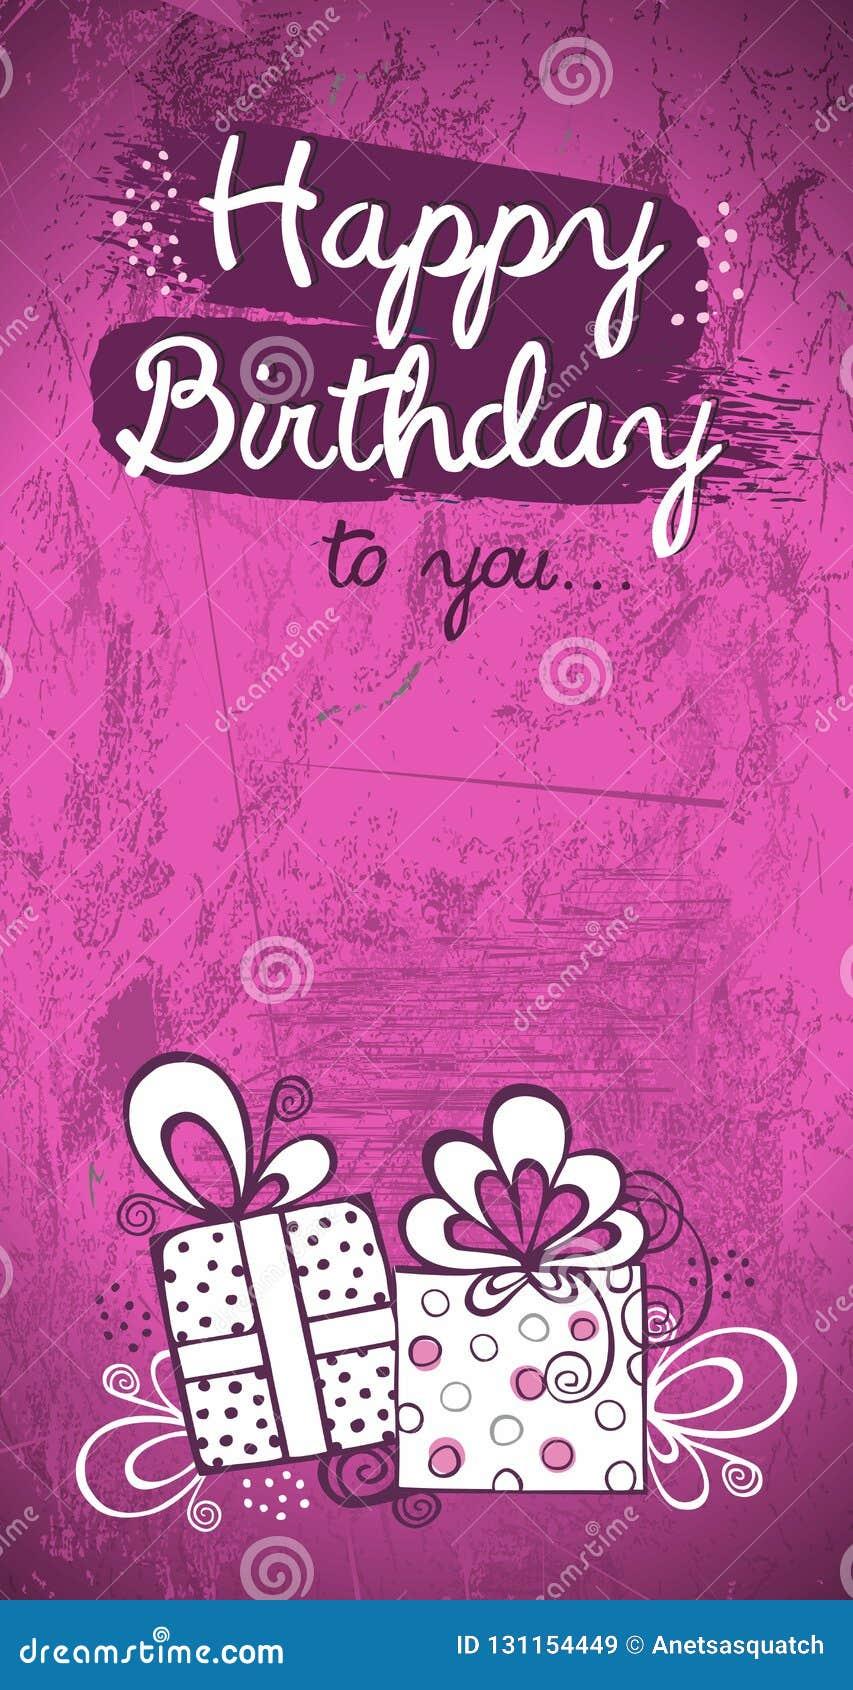 Birthday Invitation Card, Greeting Card Vector Design, Pink